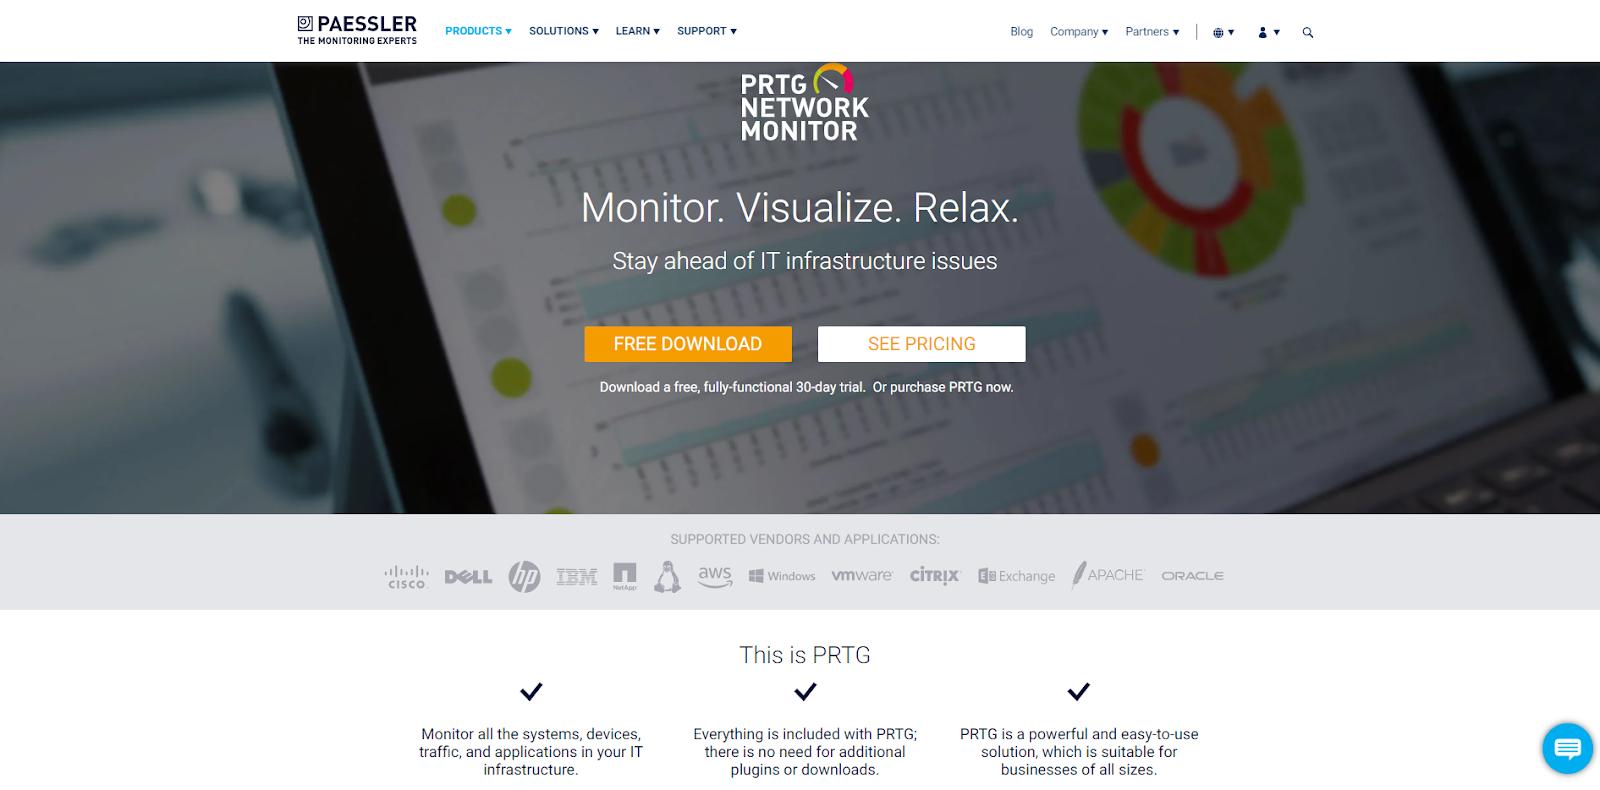 Network Monitoring Tool - Paessler PRTG Network Monitoring